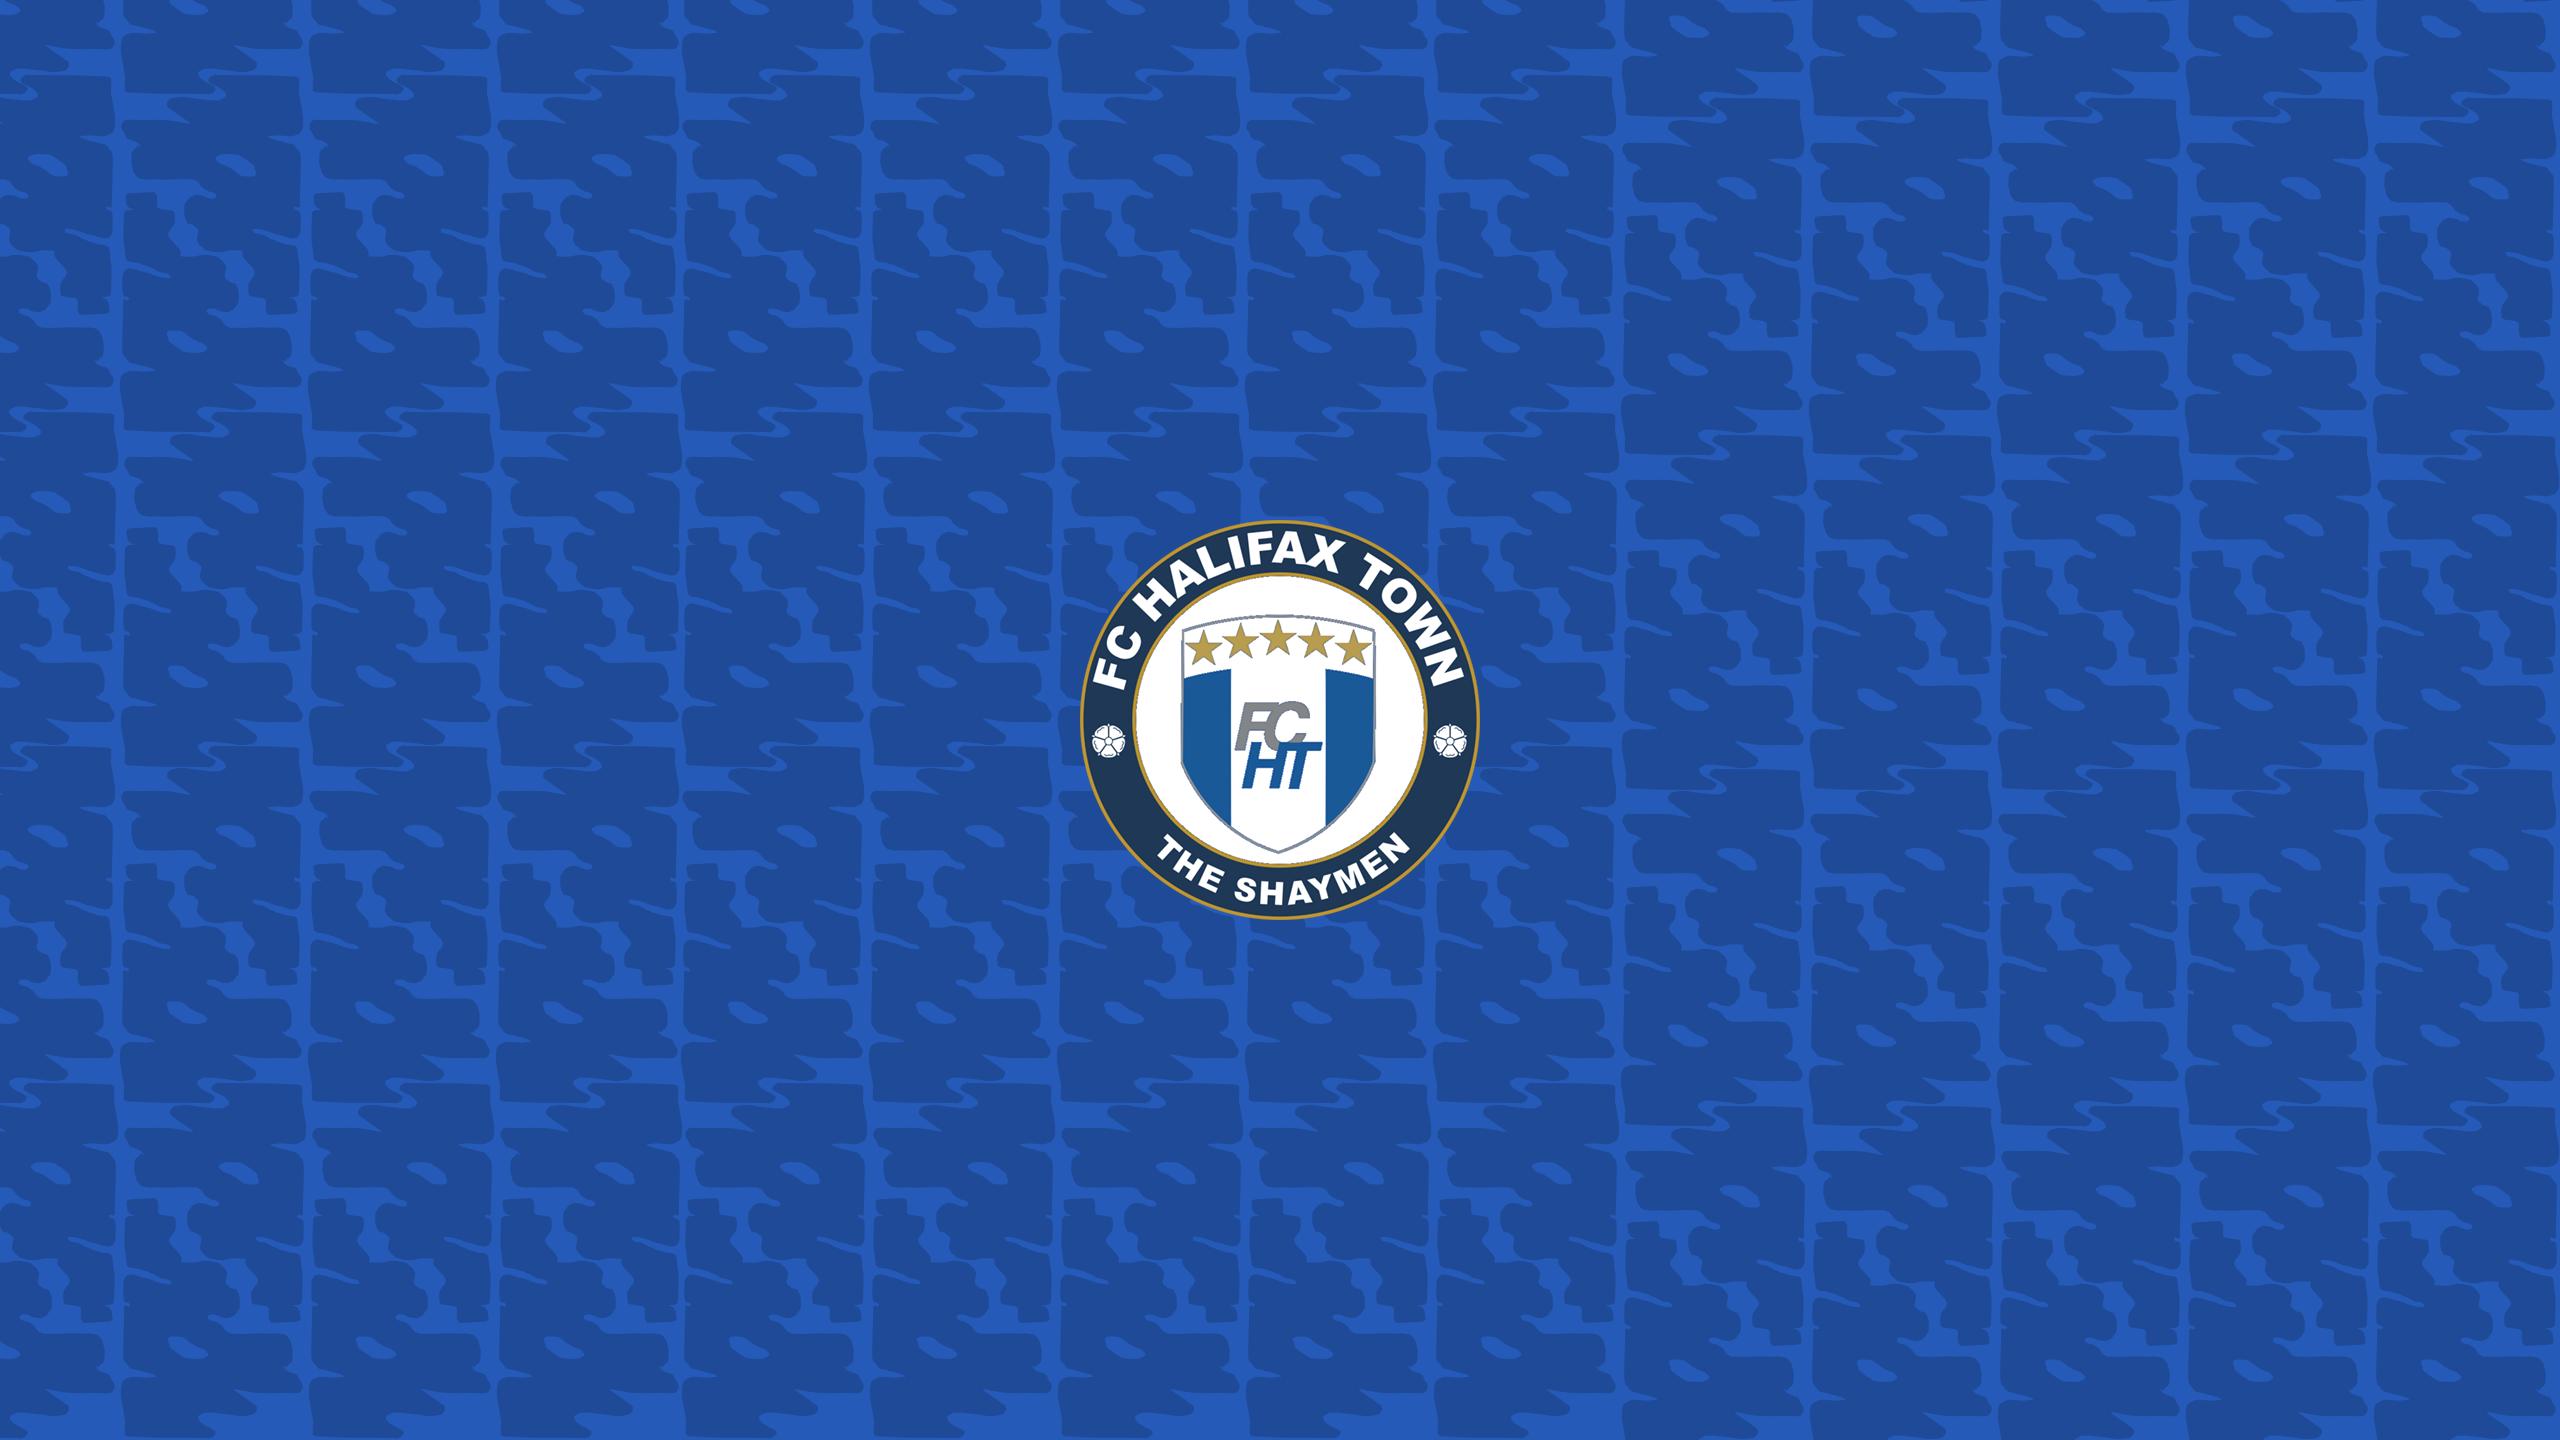 Halifax Town FC